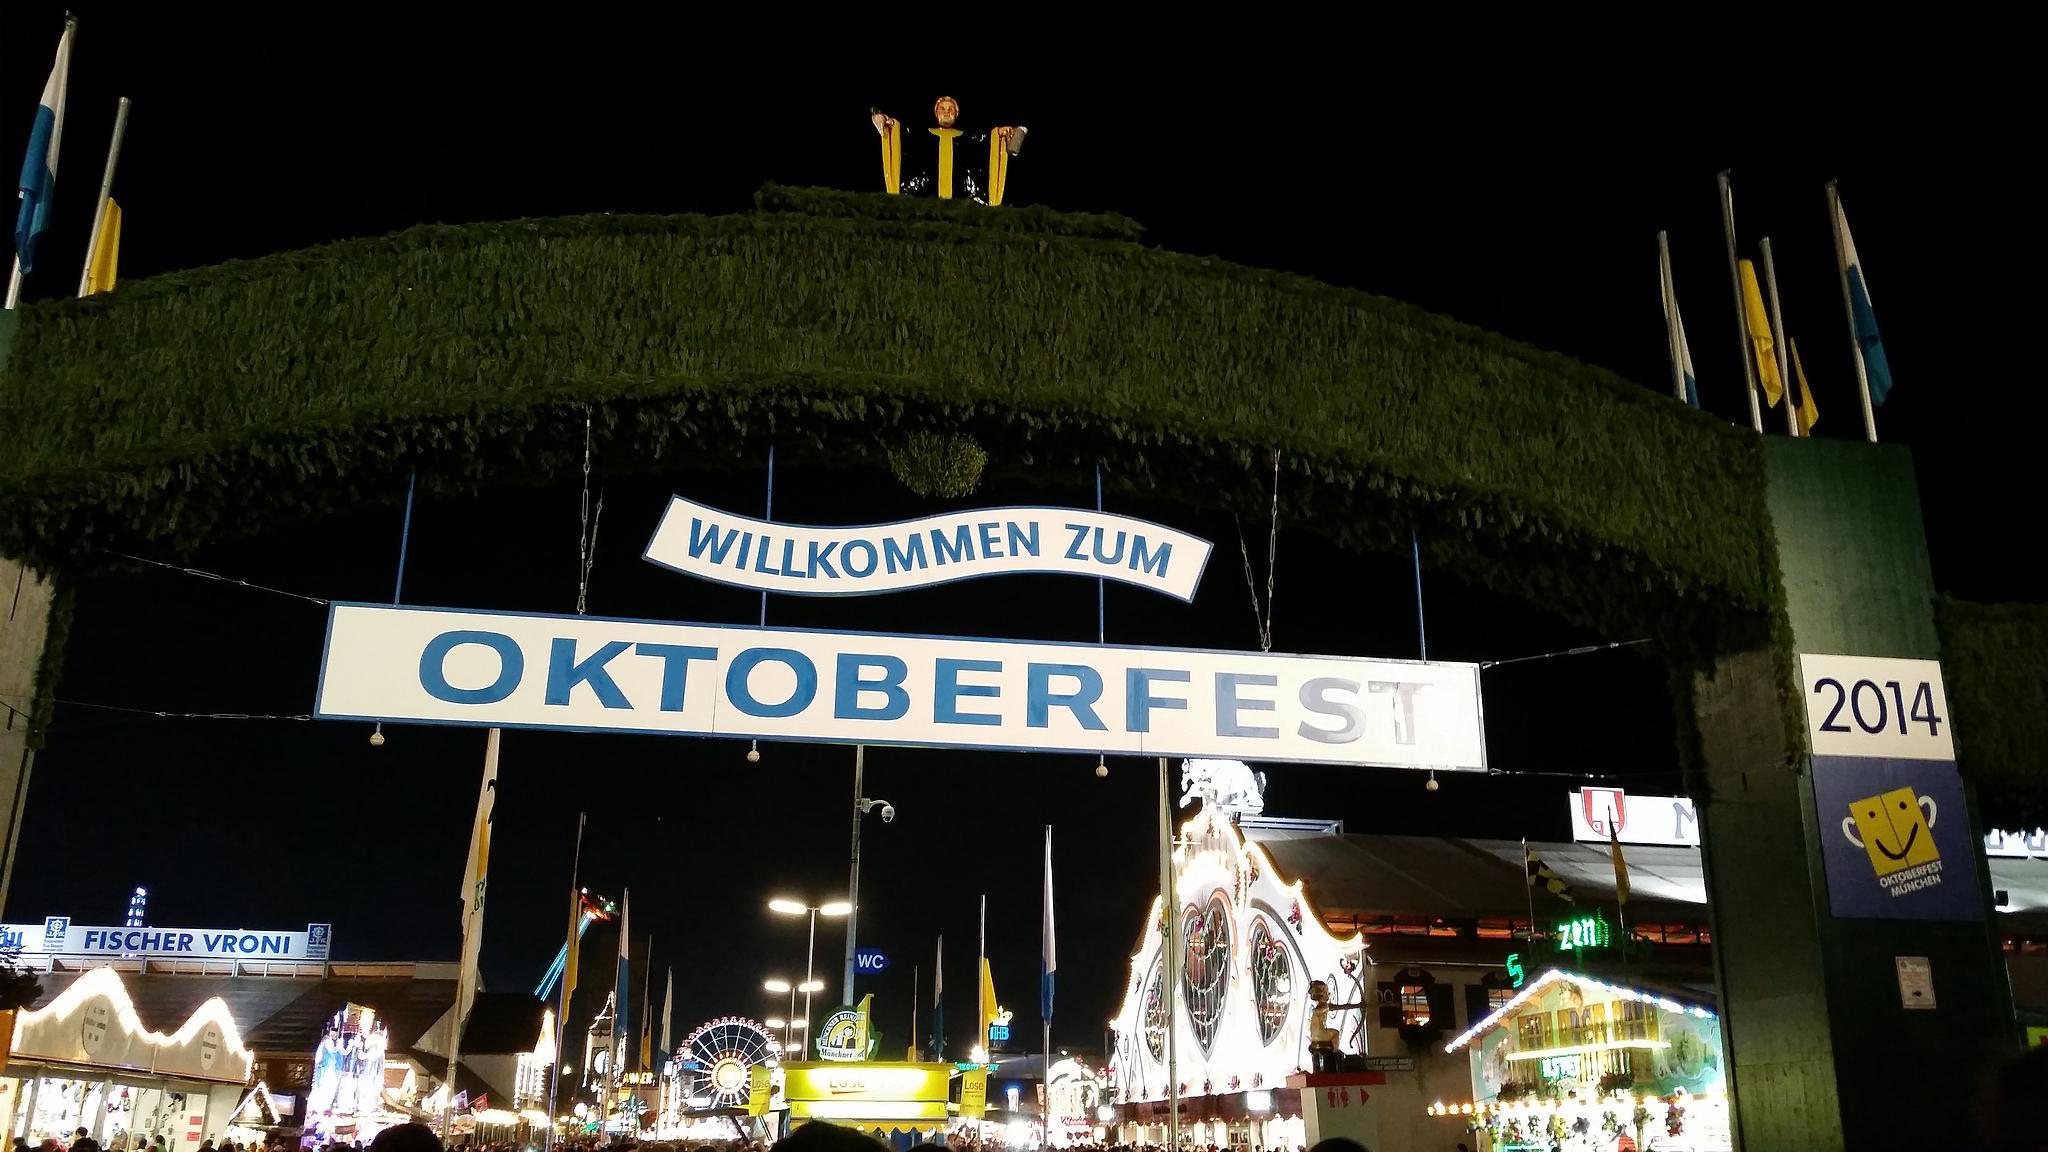 Munchen Oktoberfest 2014 by erics67